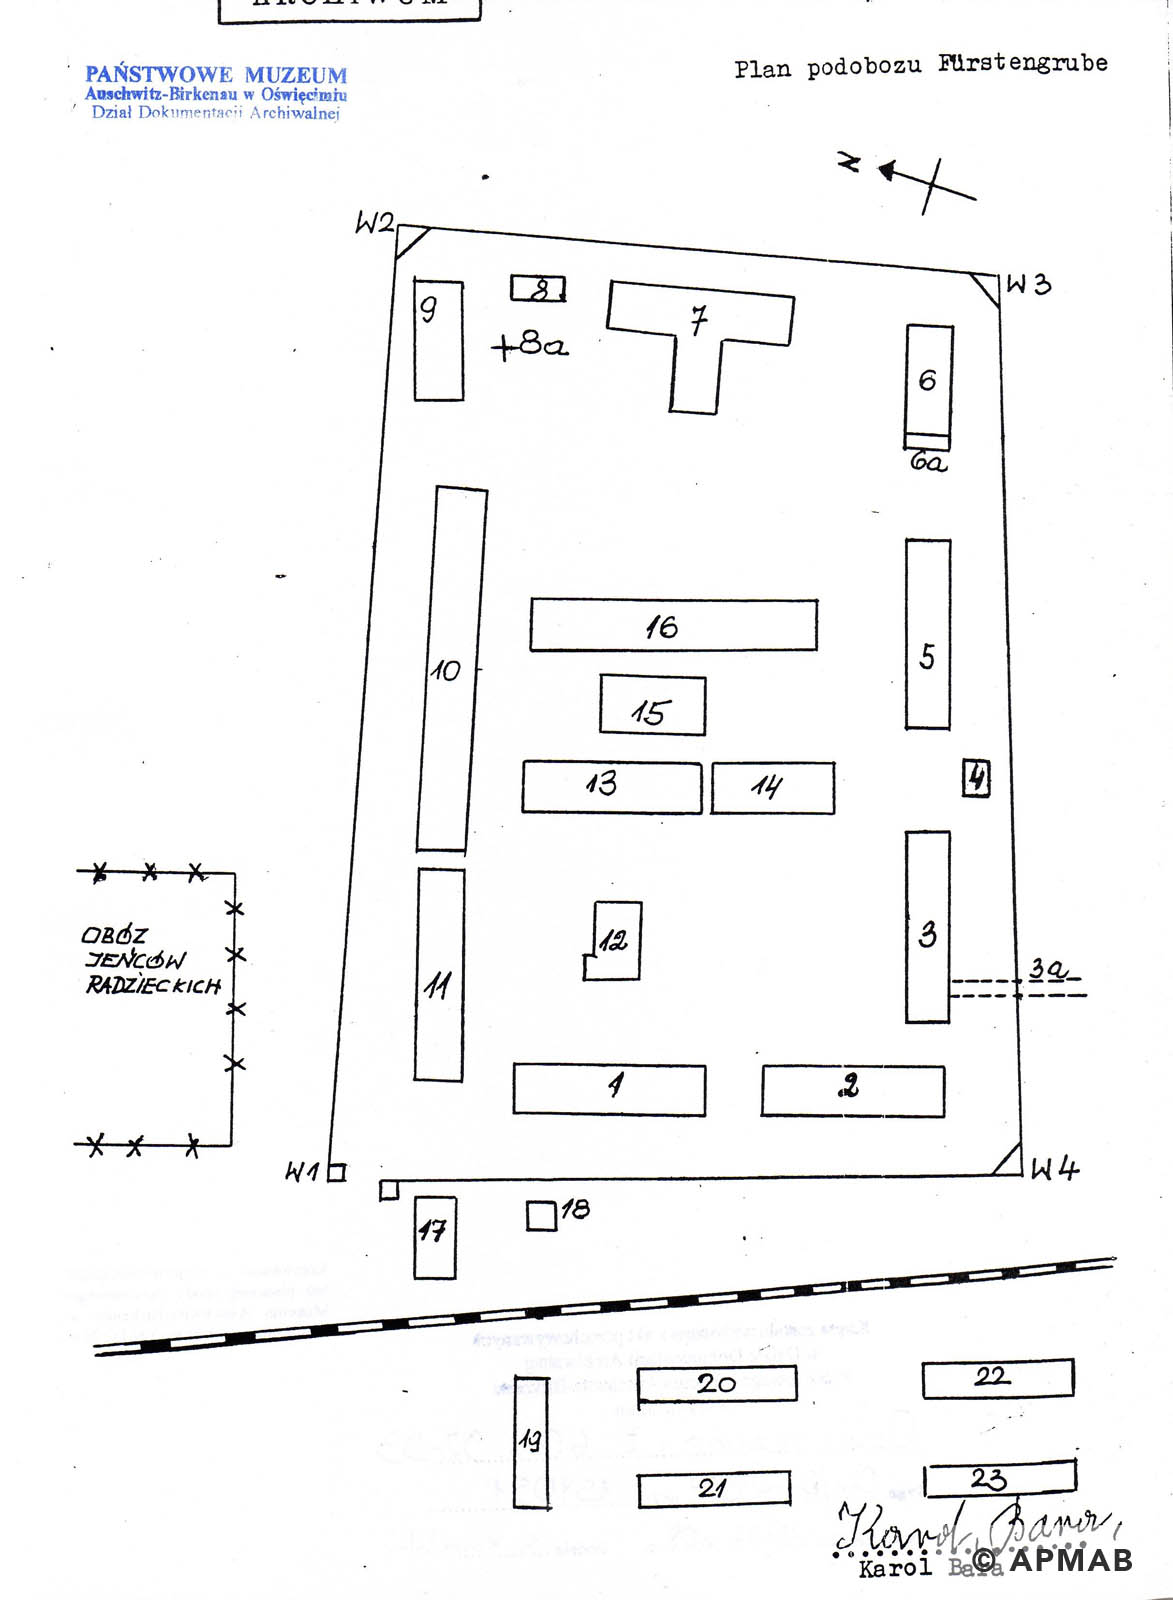 Former prisoner drawing of Fürstengrube sub camp. D. APMAB